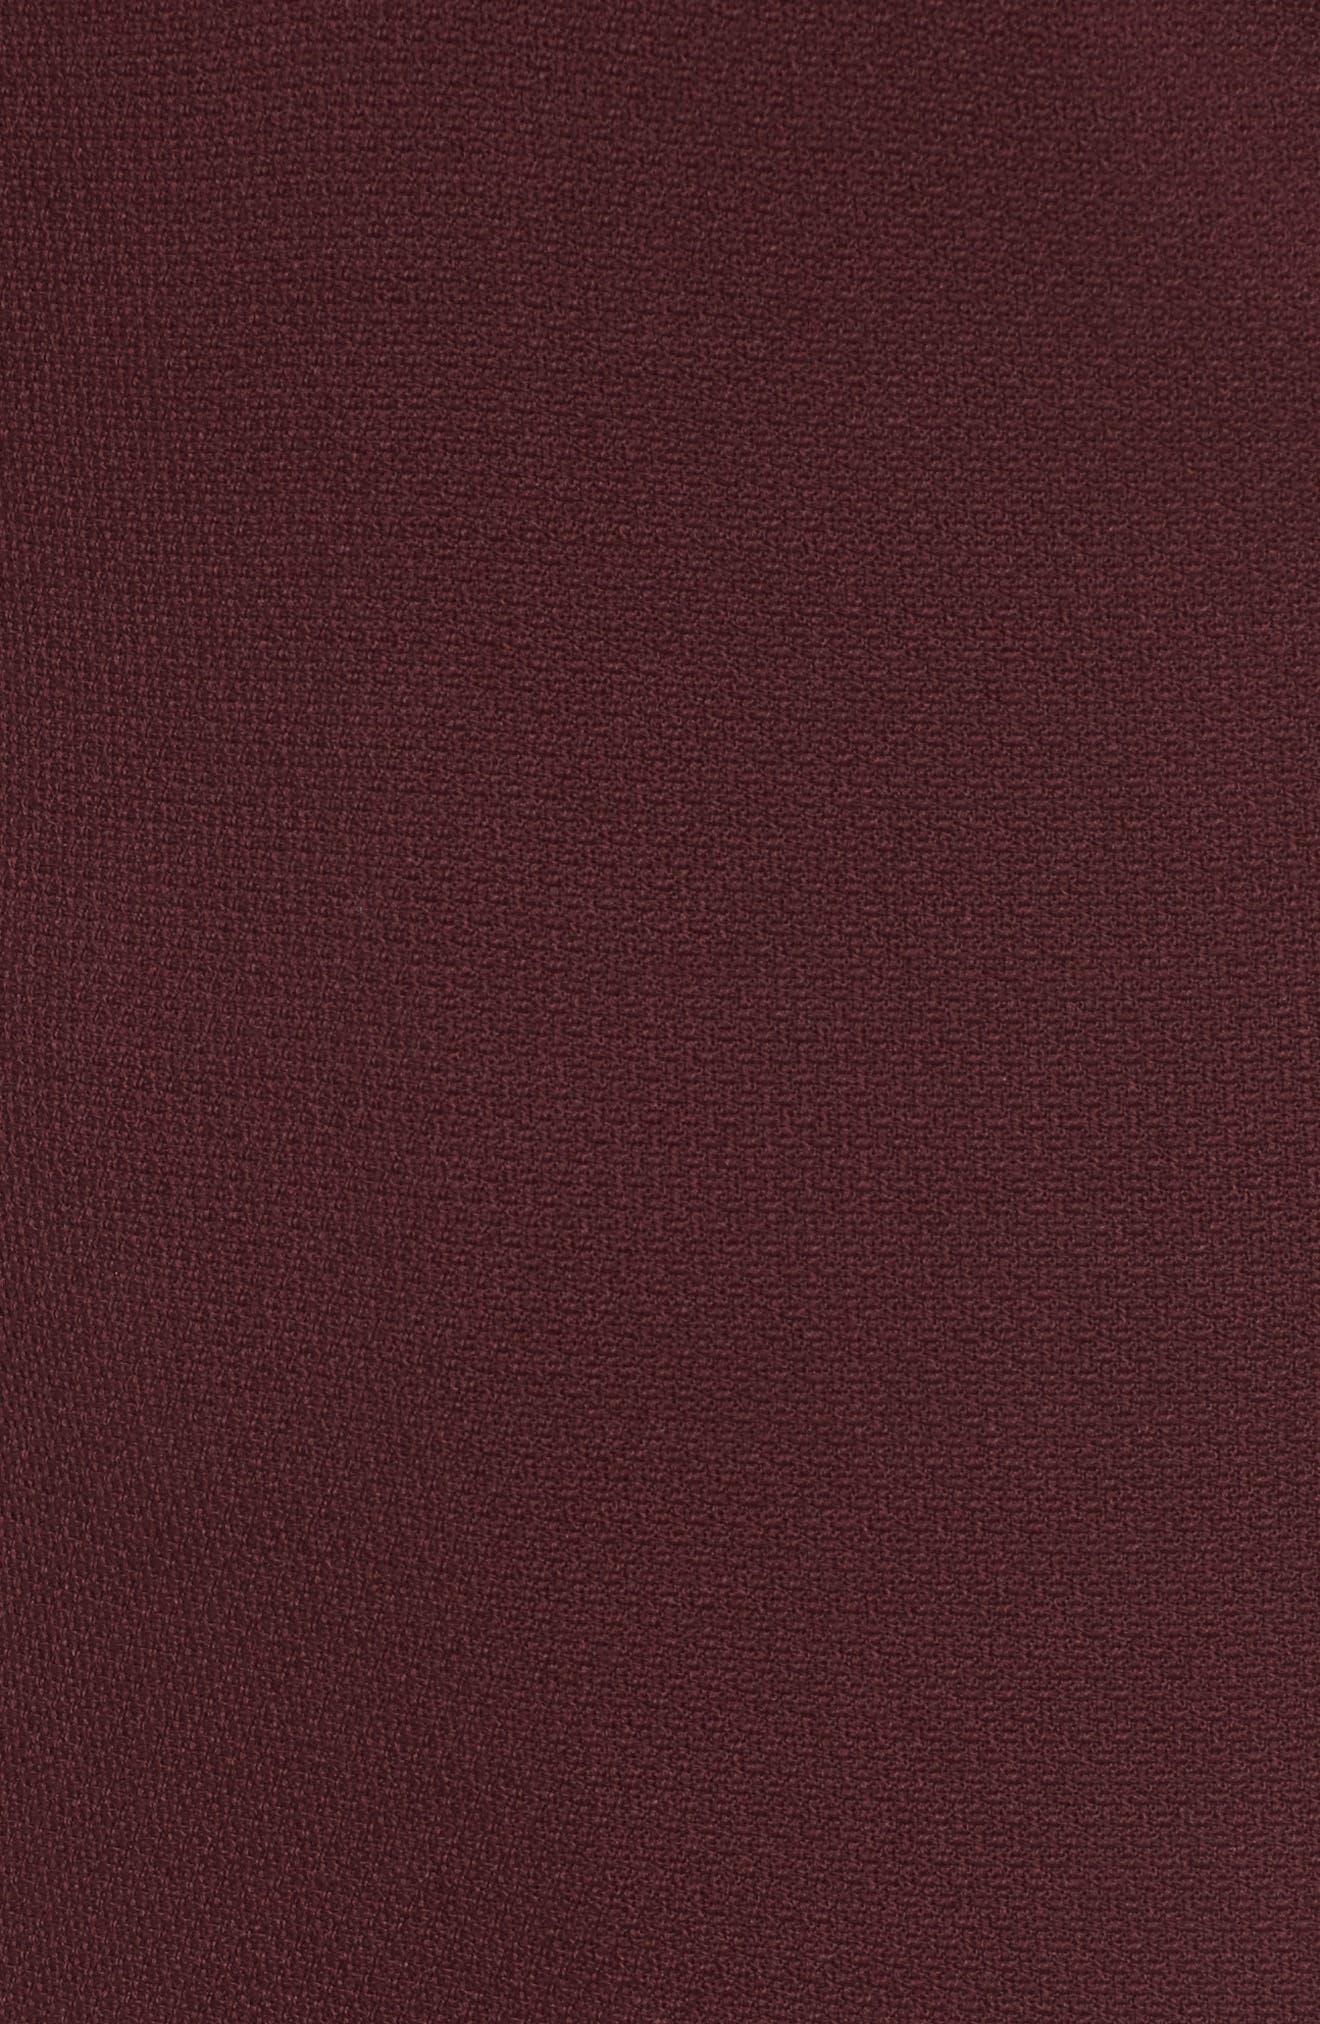 Domandia Stretch Wool Sheath Dress,                             Alternate thumbnail 5, color,                             Mulberry